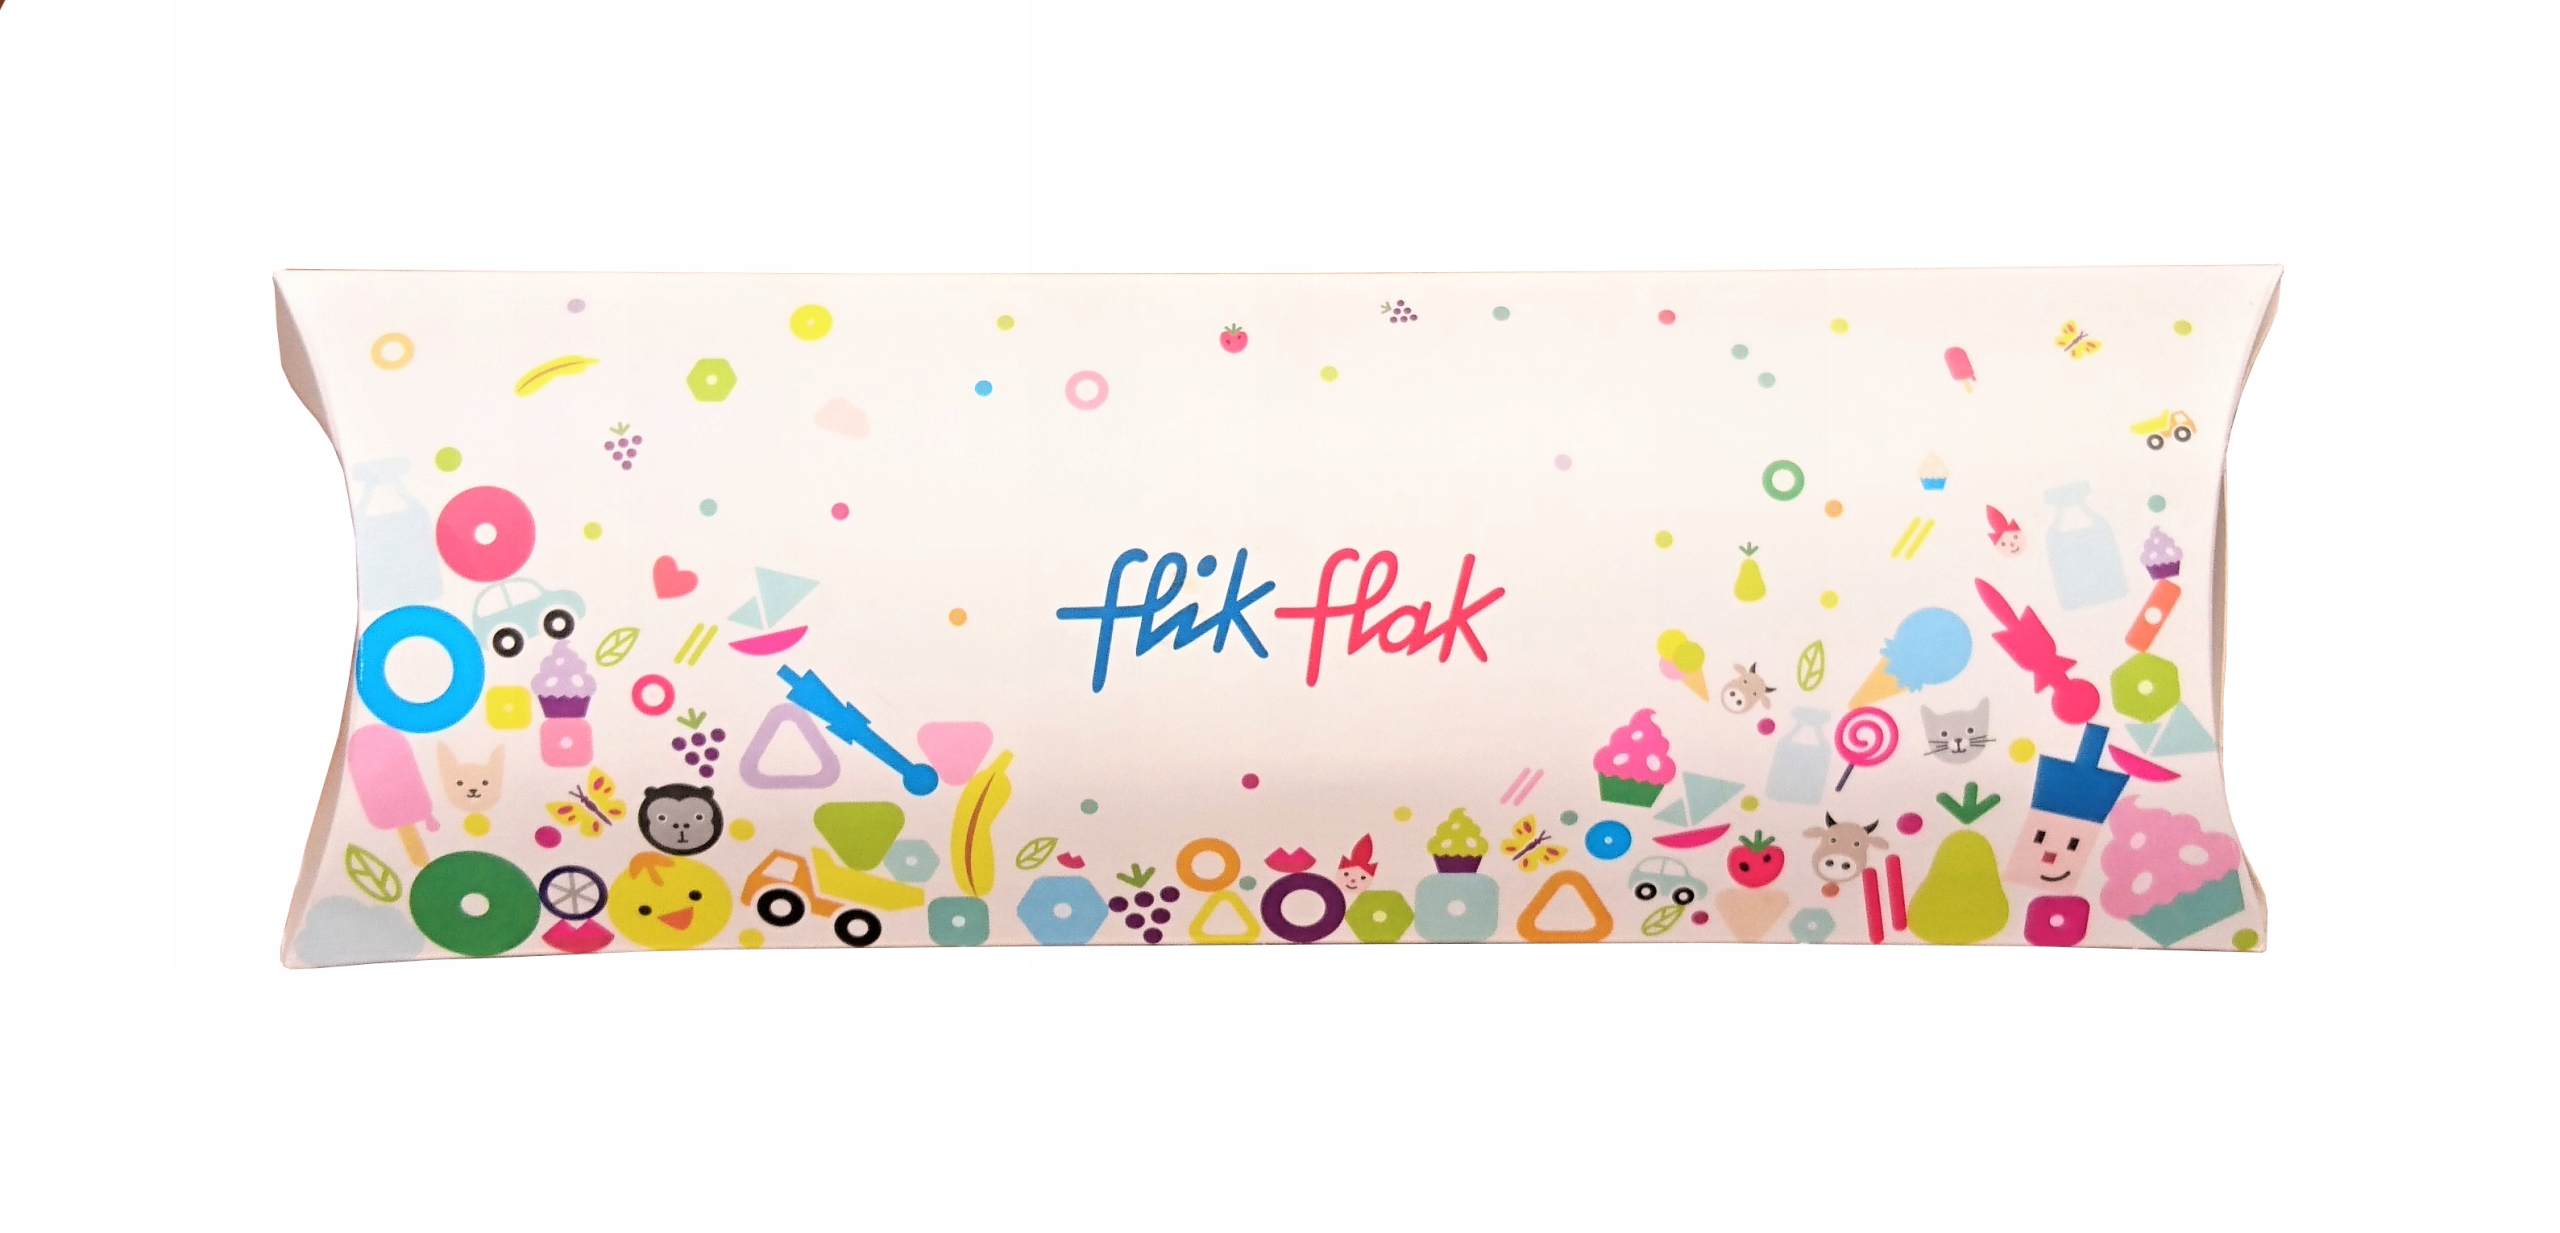 Zegarek Swatch FLik Flak Rockbeat FCSP068 Pink